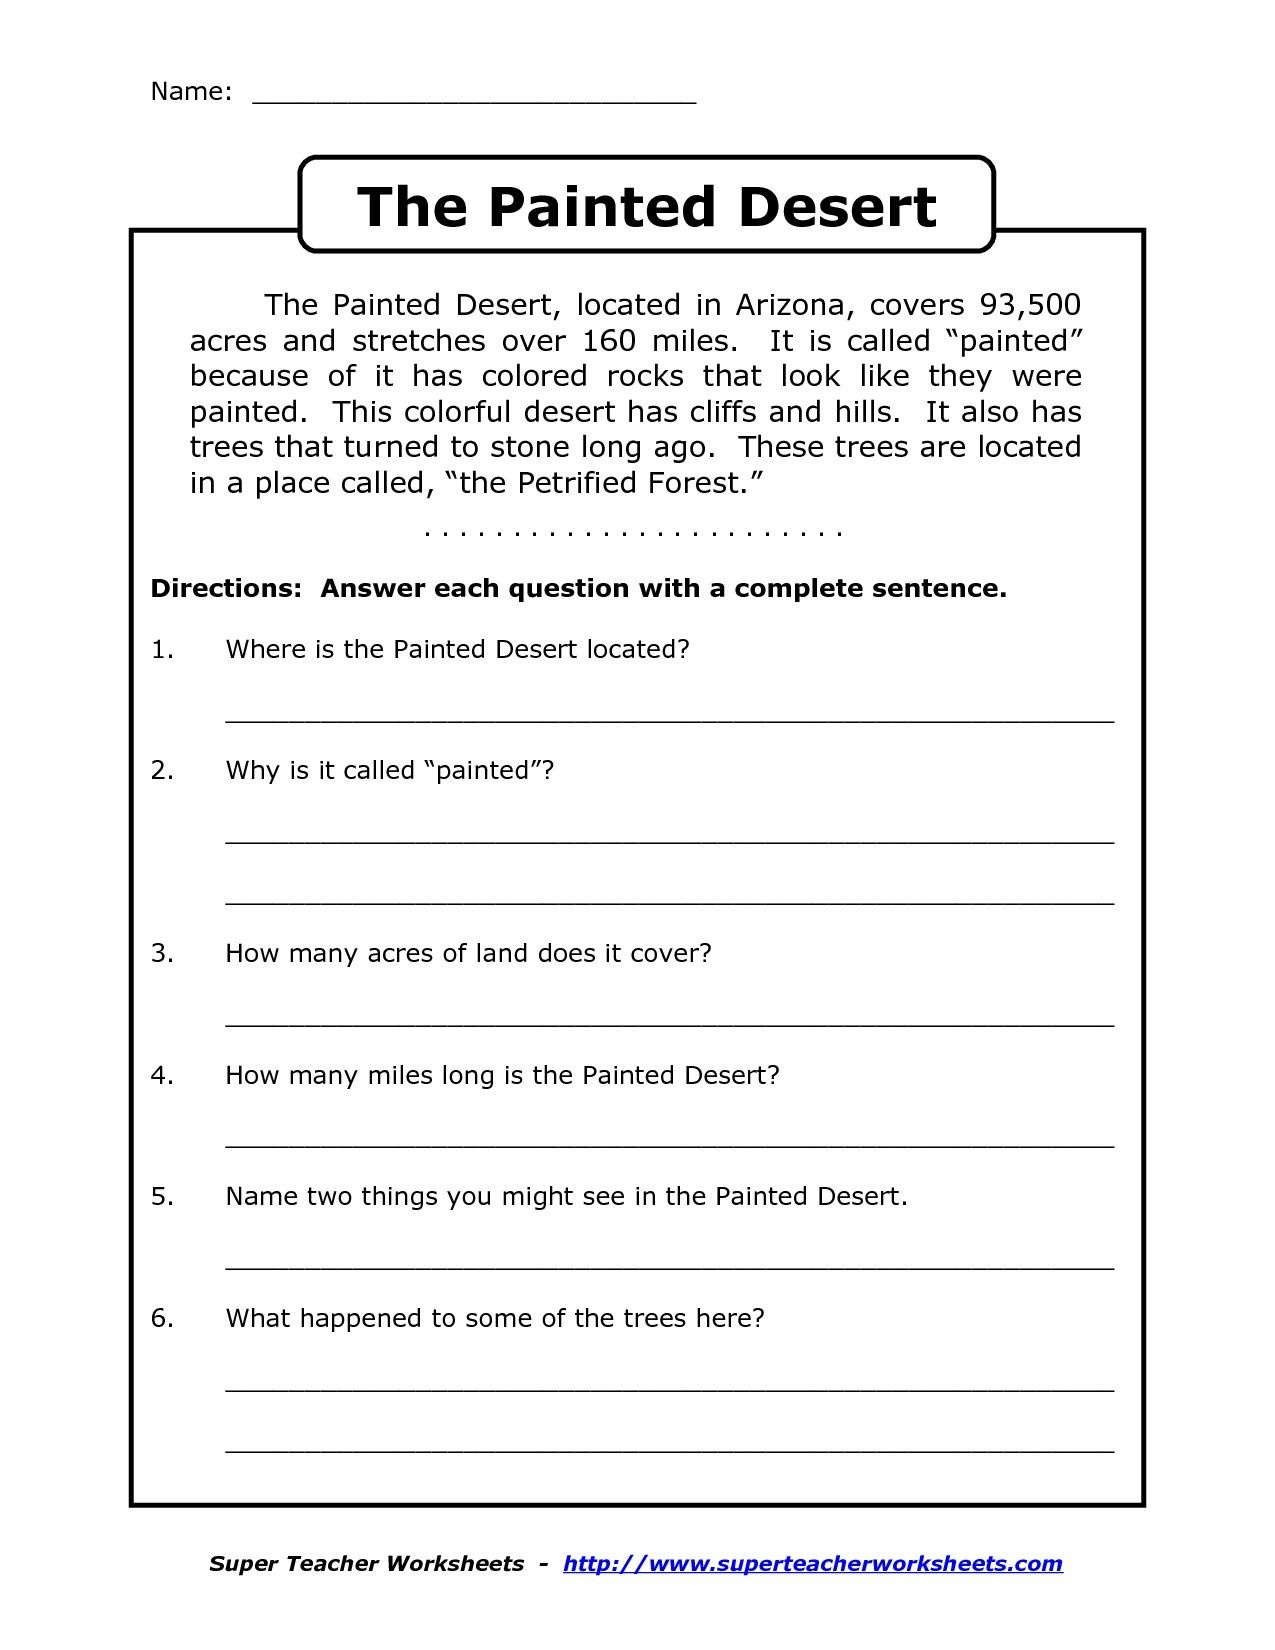 Image Result For Free Printable Worksheets For Grade 4 Comprehension - Free Printable Reading Passages For 3Rd Grade